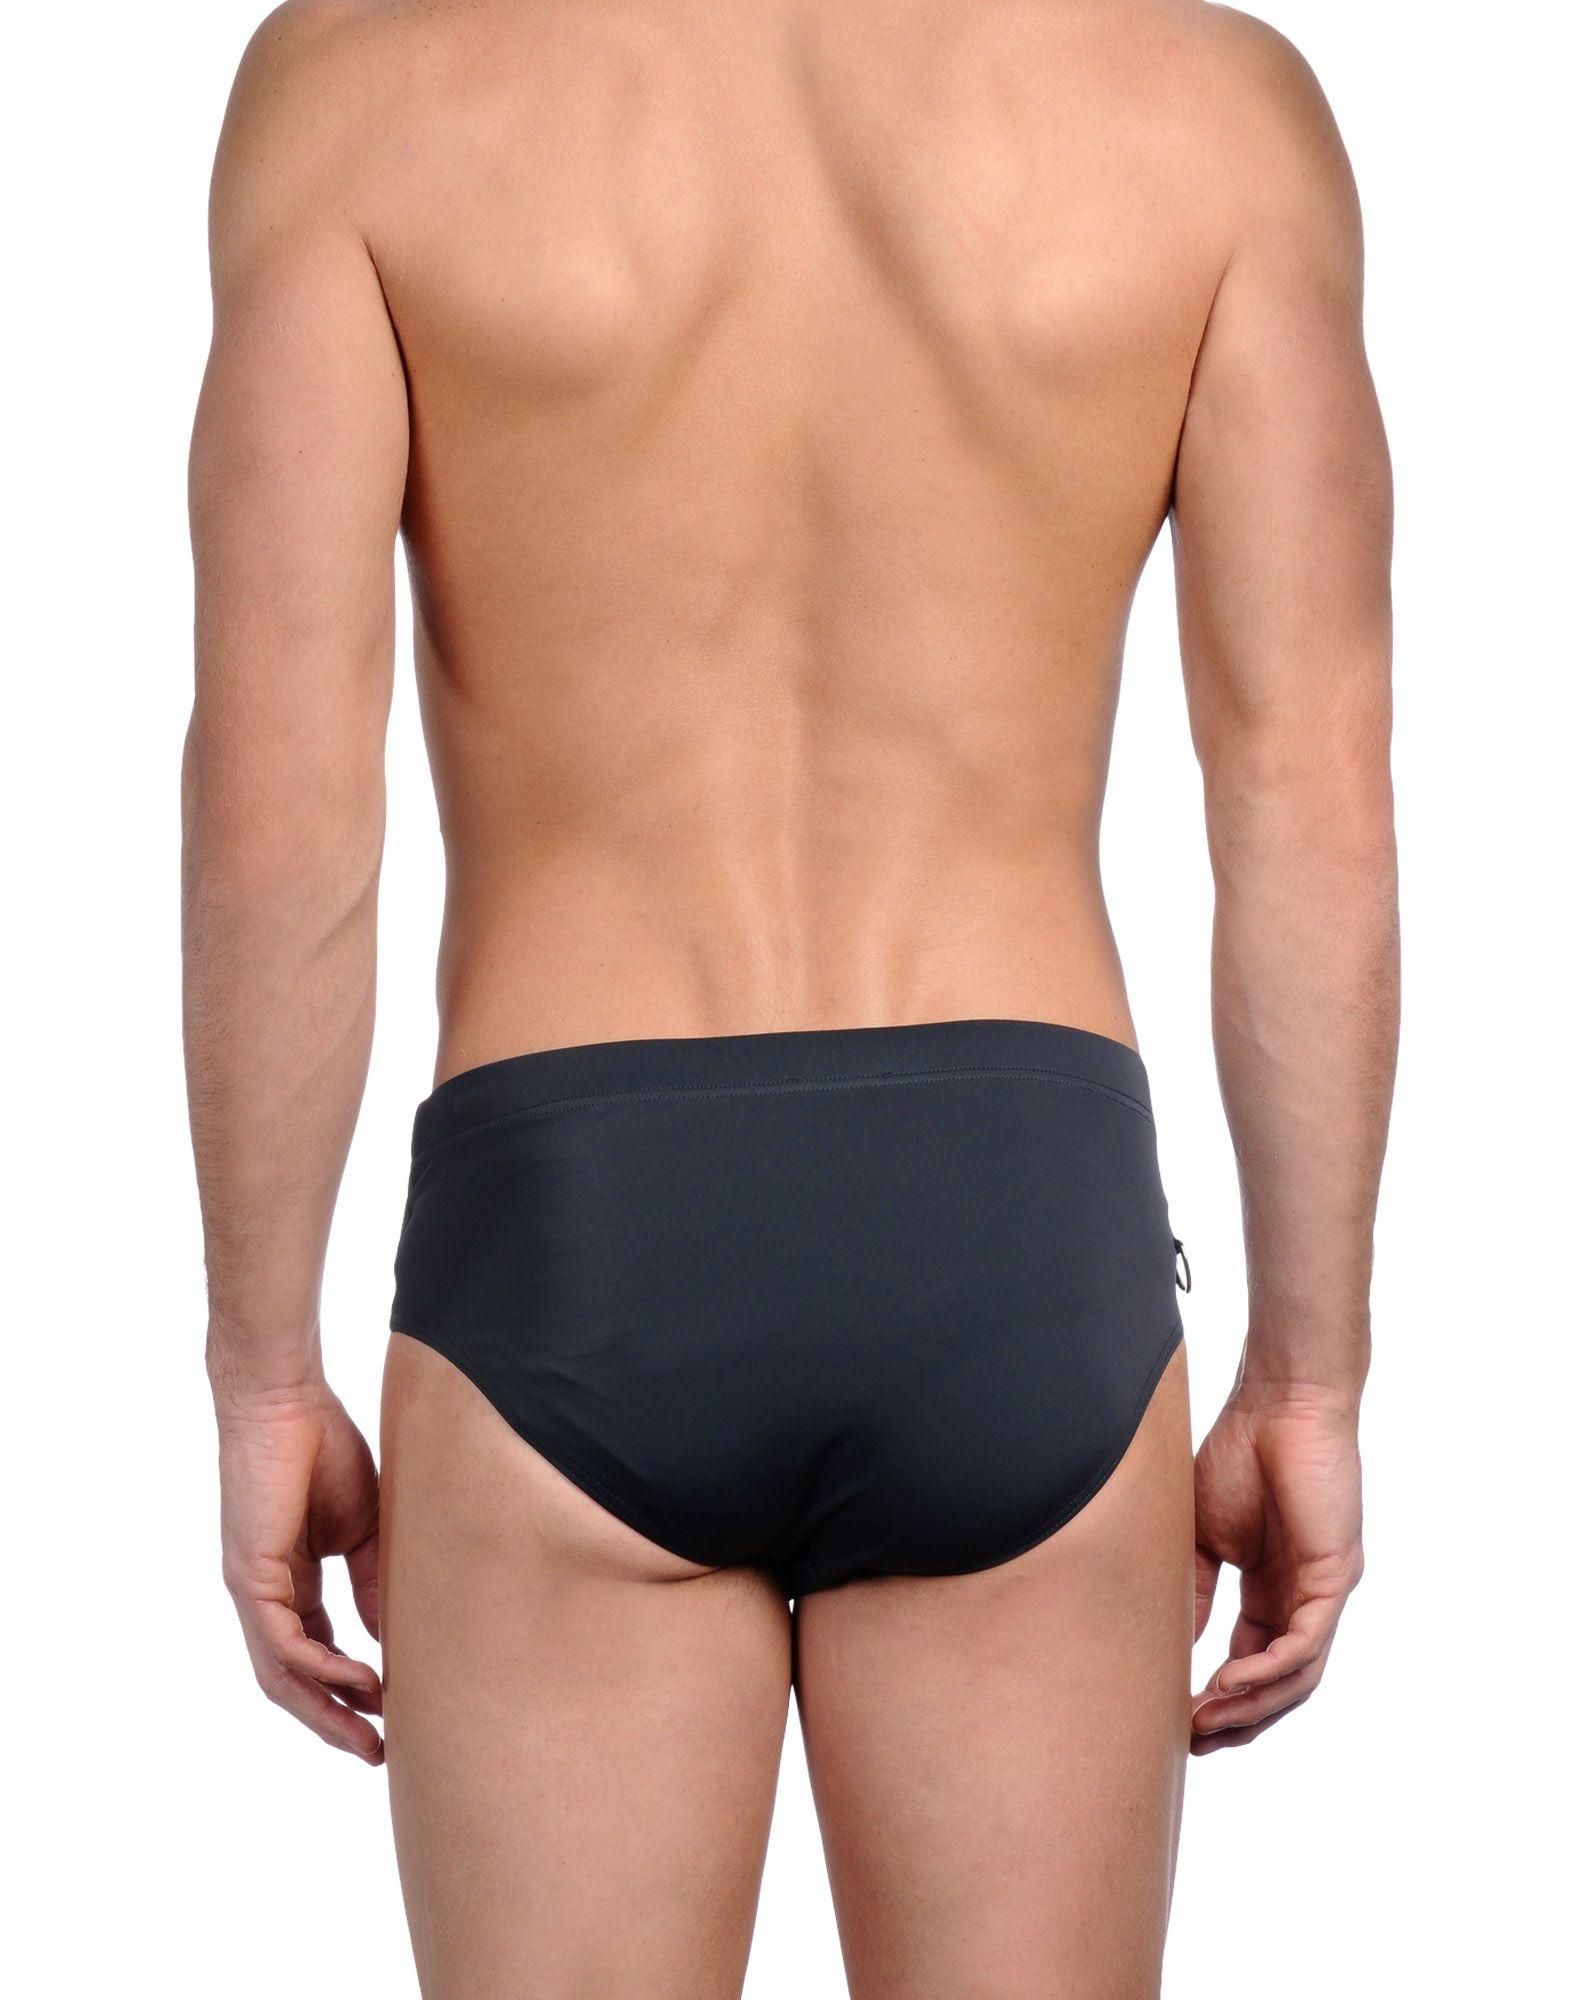 Dior homme Bikini Bottoms in Gray for Men